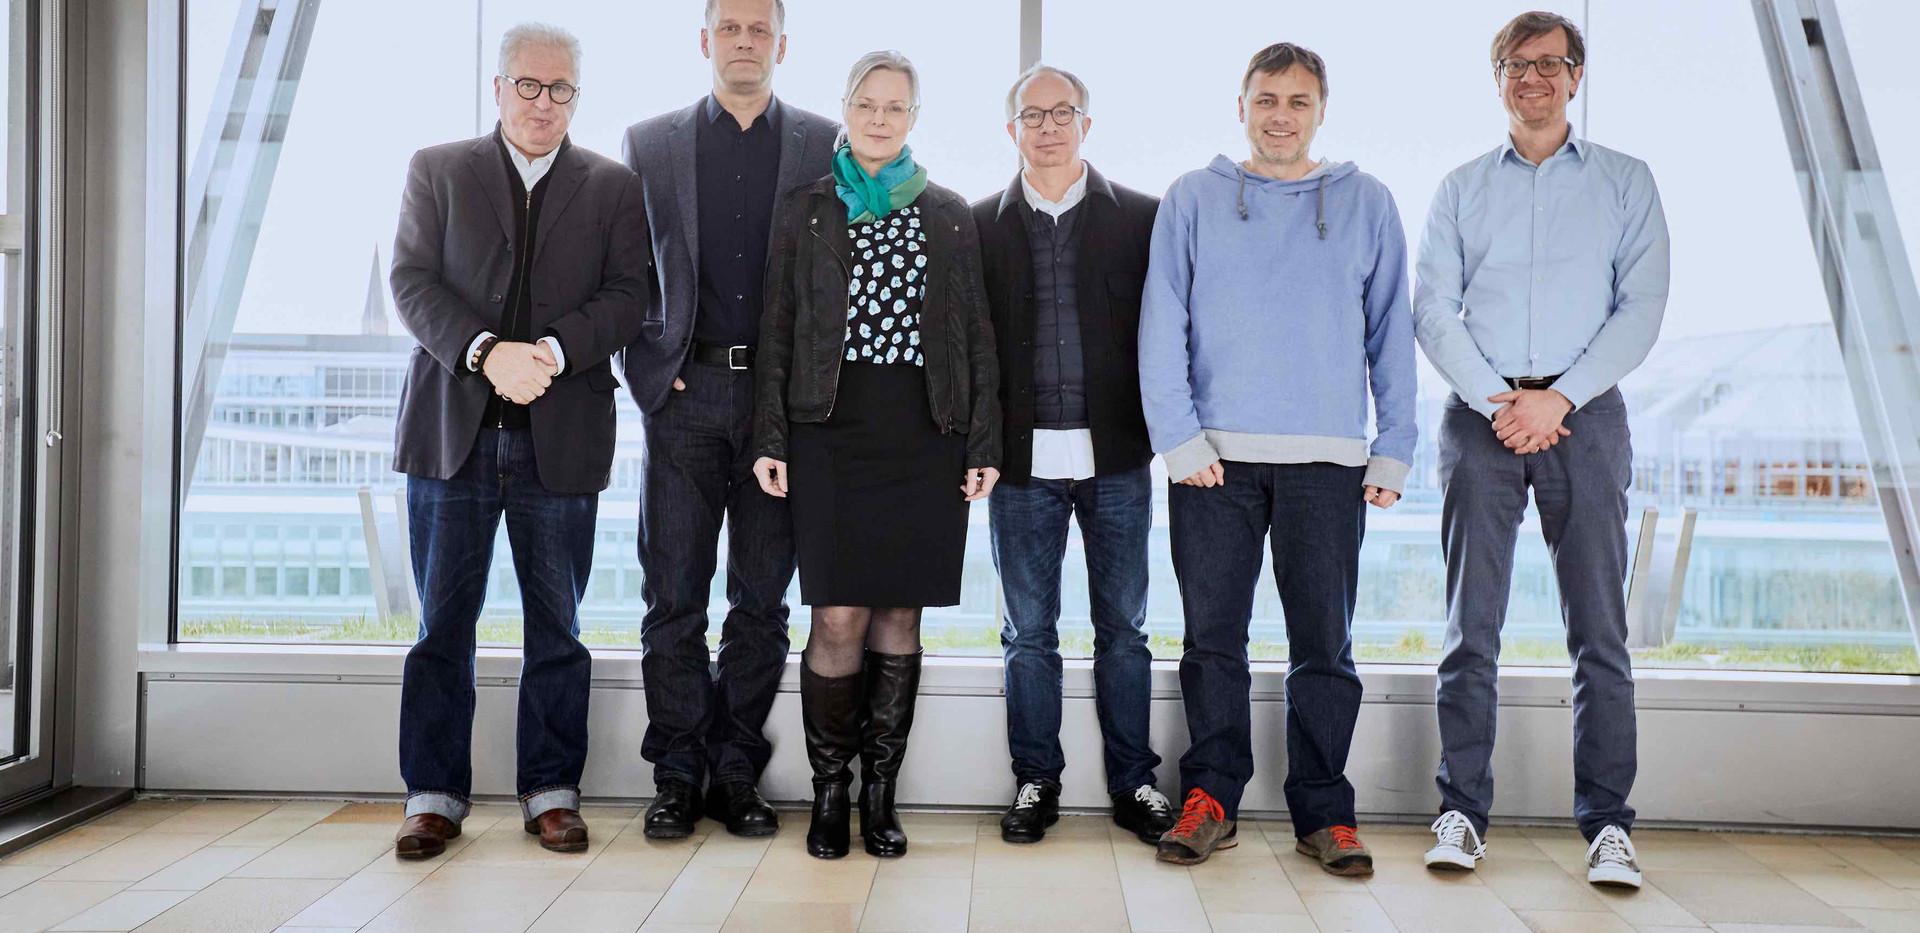 Expert Jury 2020:  Von links nach rechts: Uni. Prof. Wolfgang Sattler, Tim Oelker, Veronika Eggers, Martin Fößleitner, Rainer Langer , Moritz Segers